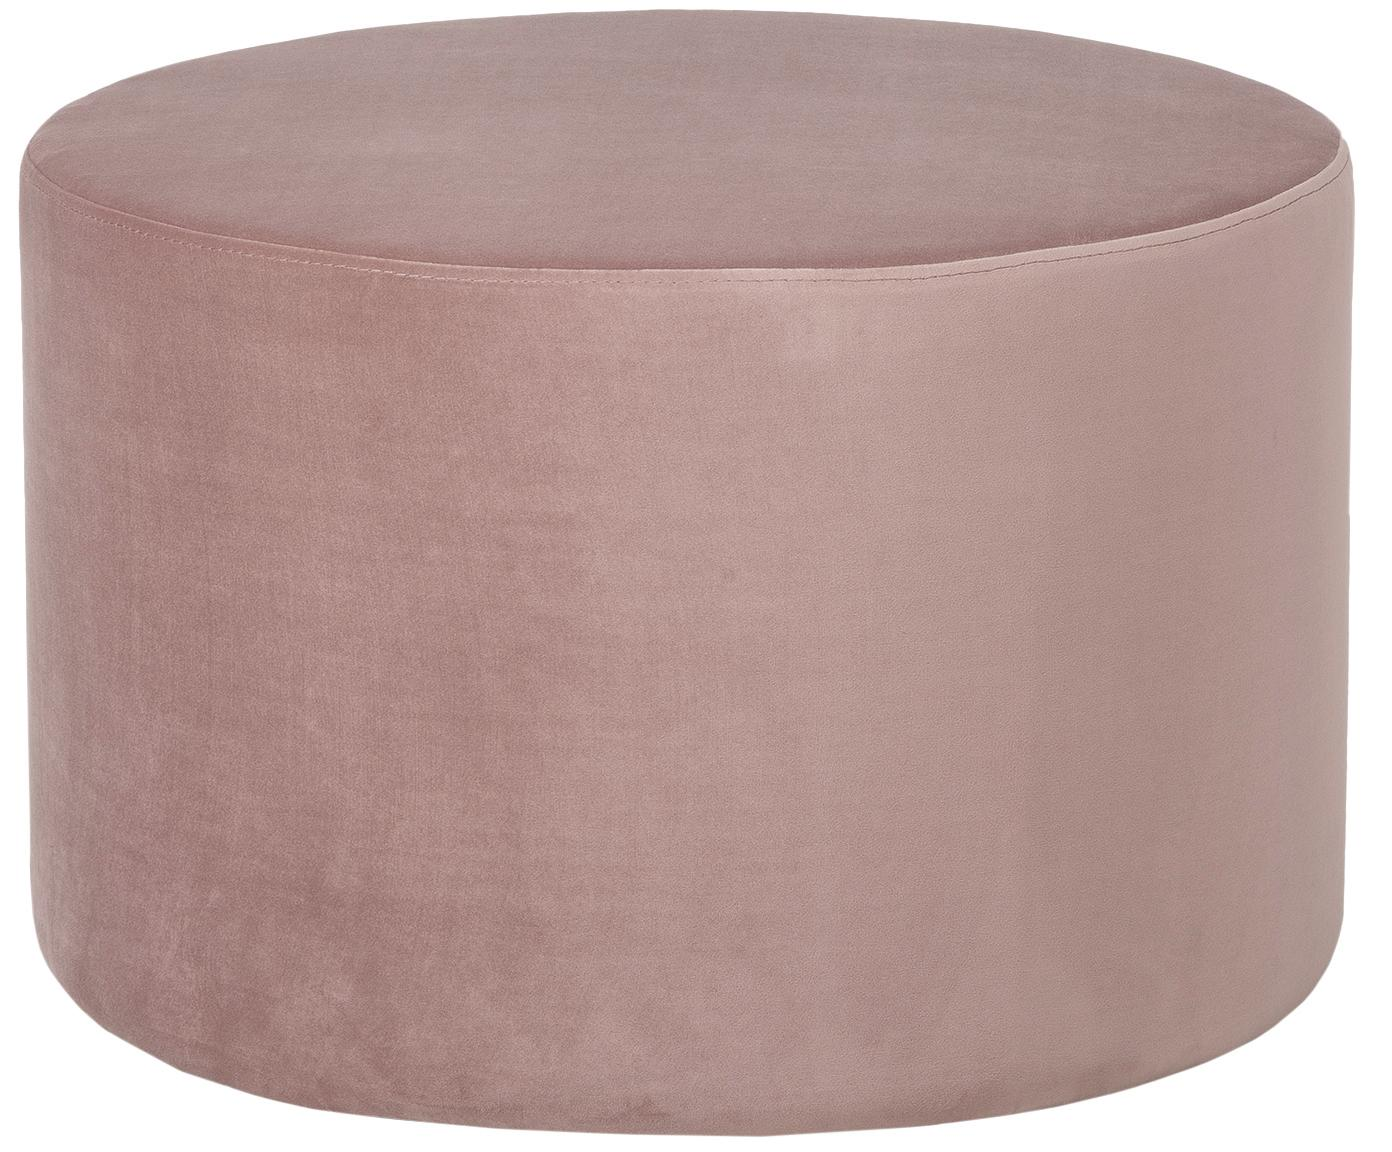 Puf de terciopelo Daisy, Tapizado: terciopelo (poliéster) 15, Estructura: tablero de fibras de dens, Rosa, Ø 62 x Al 41 cm